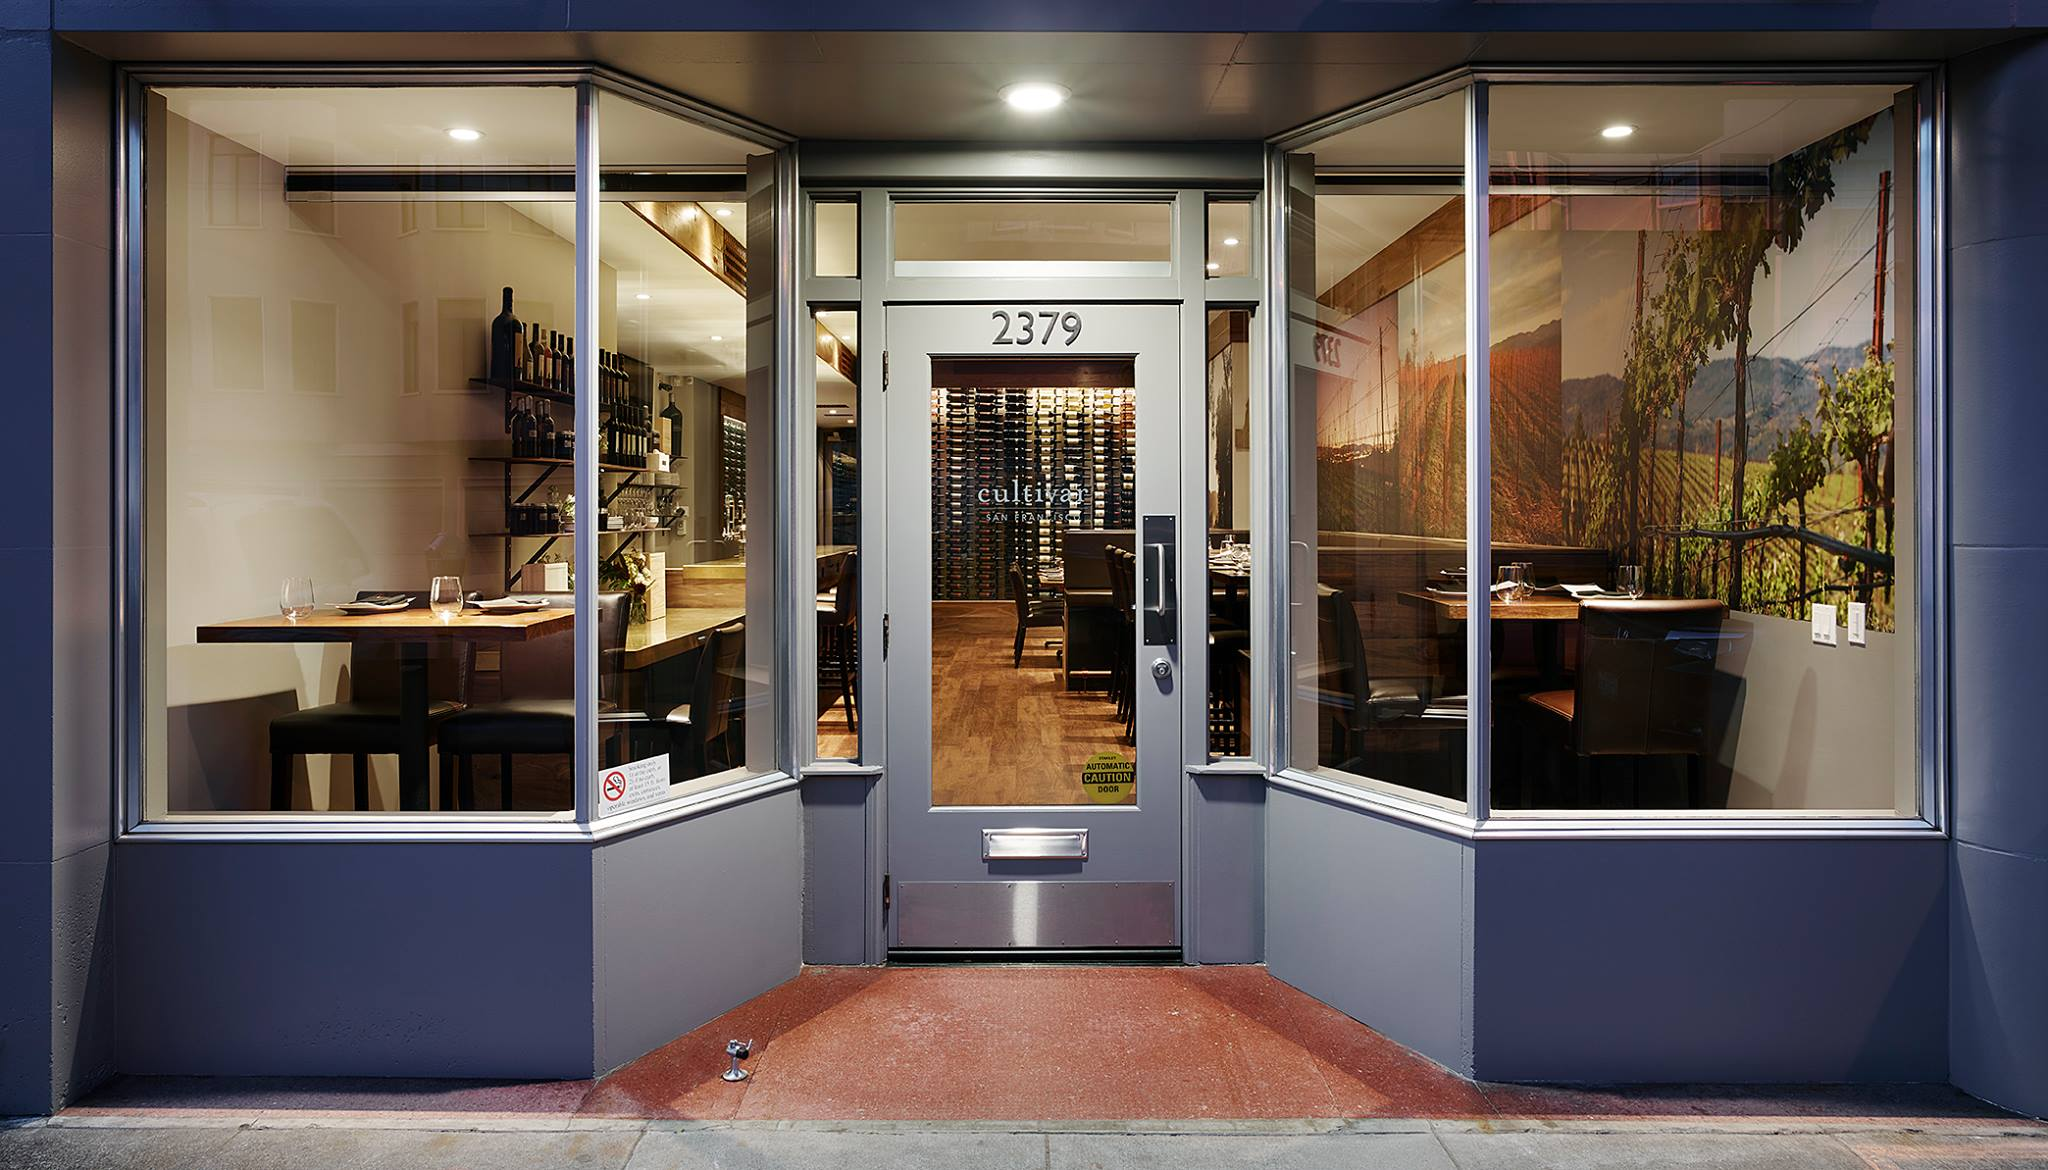 Cultivar's tasting room and wine bar